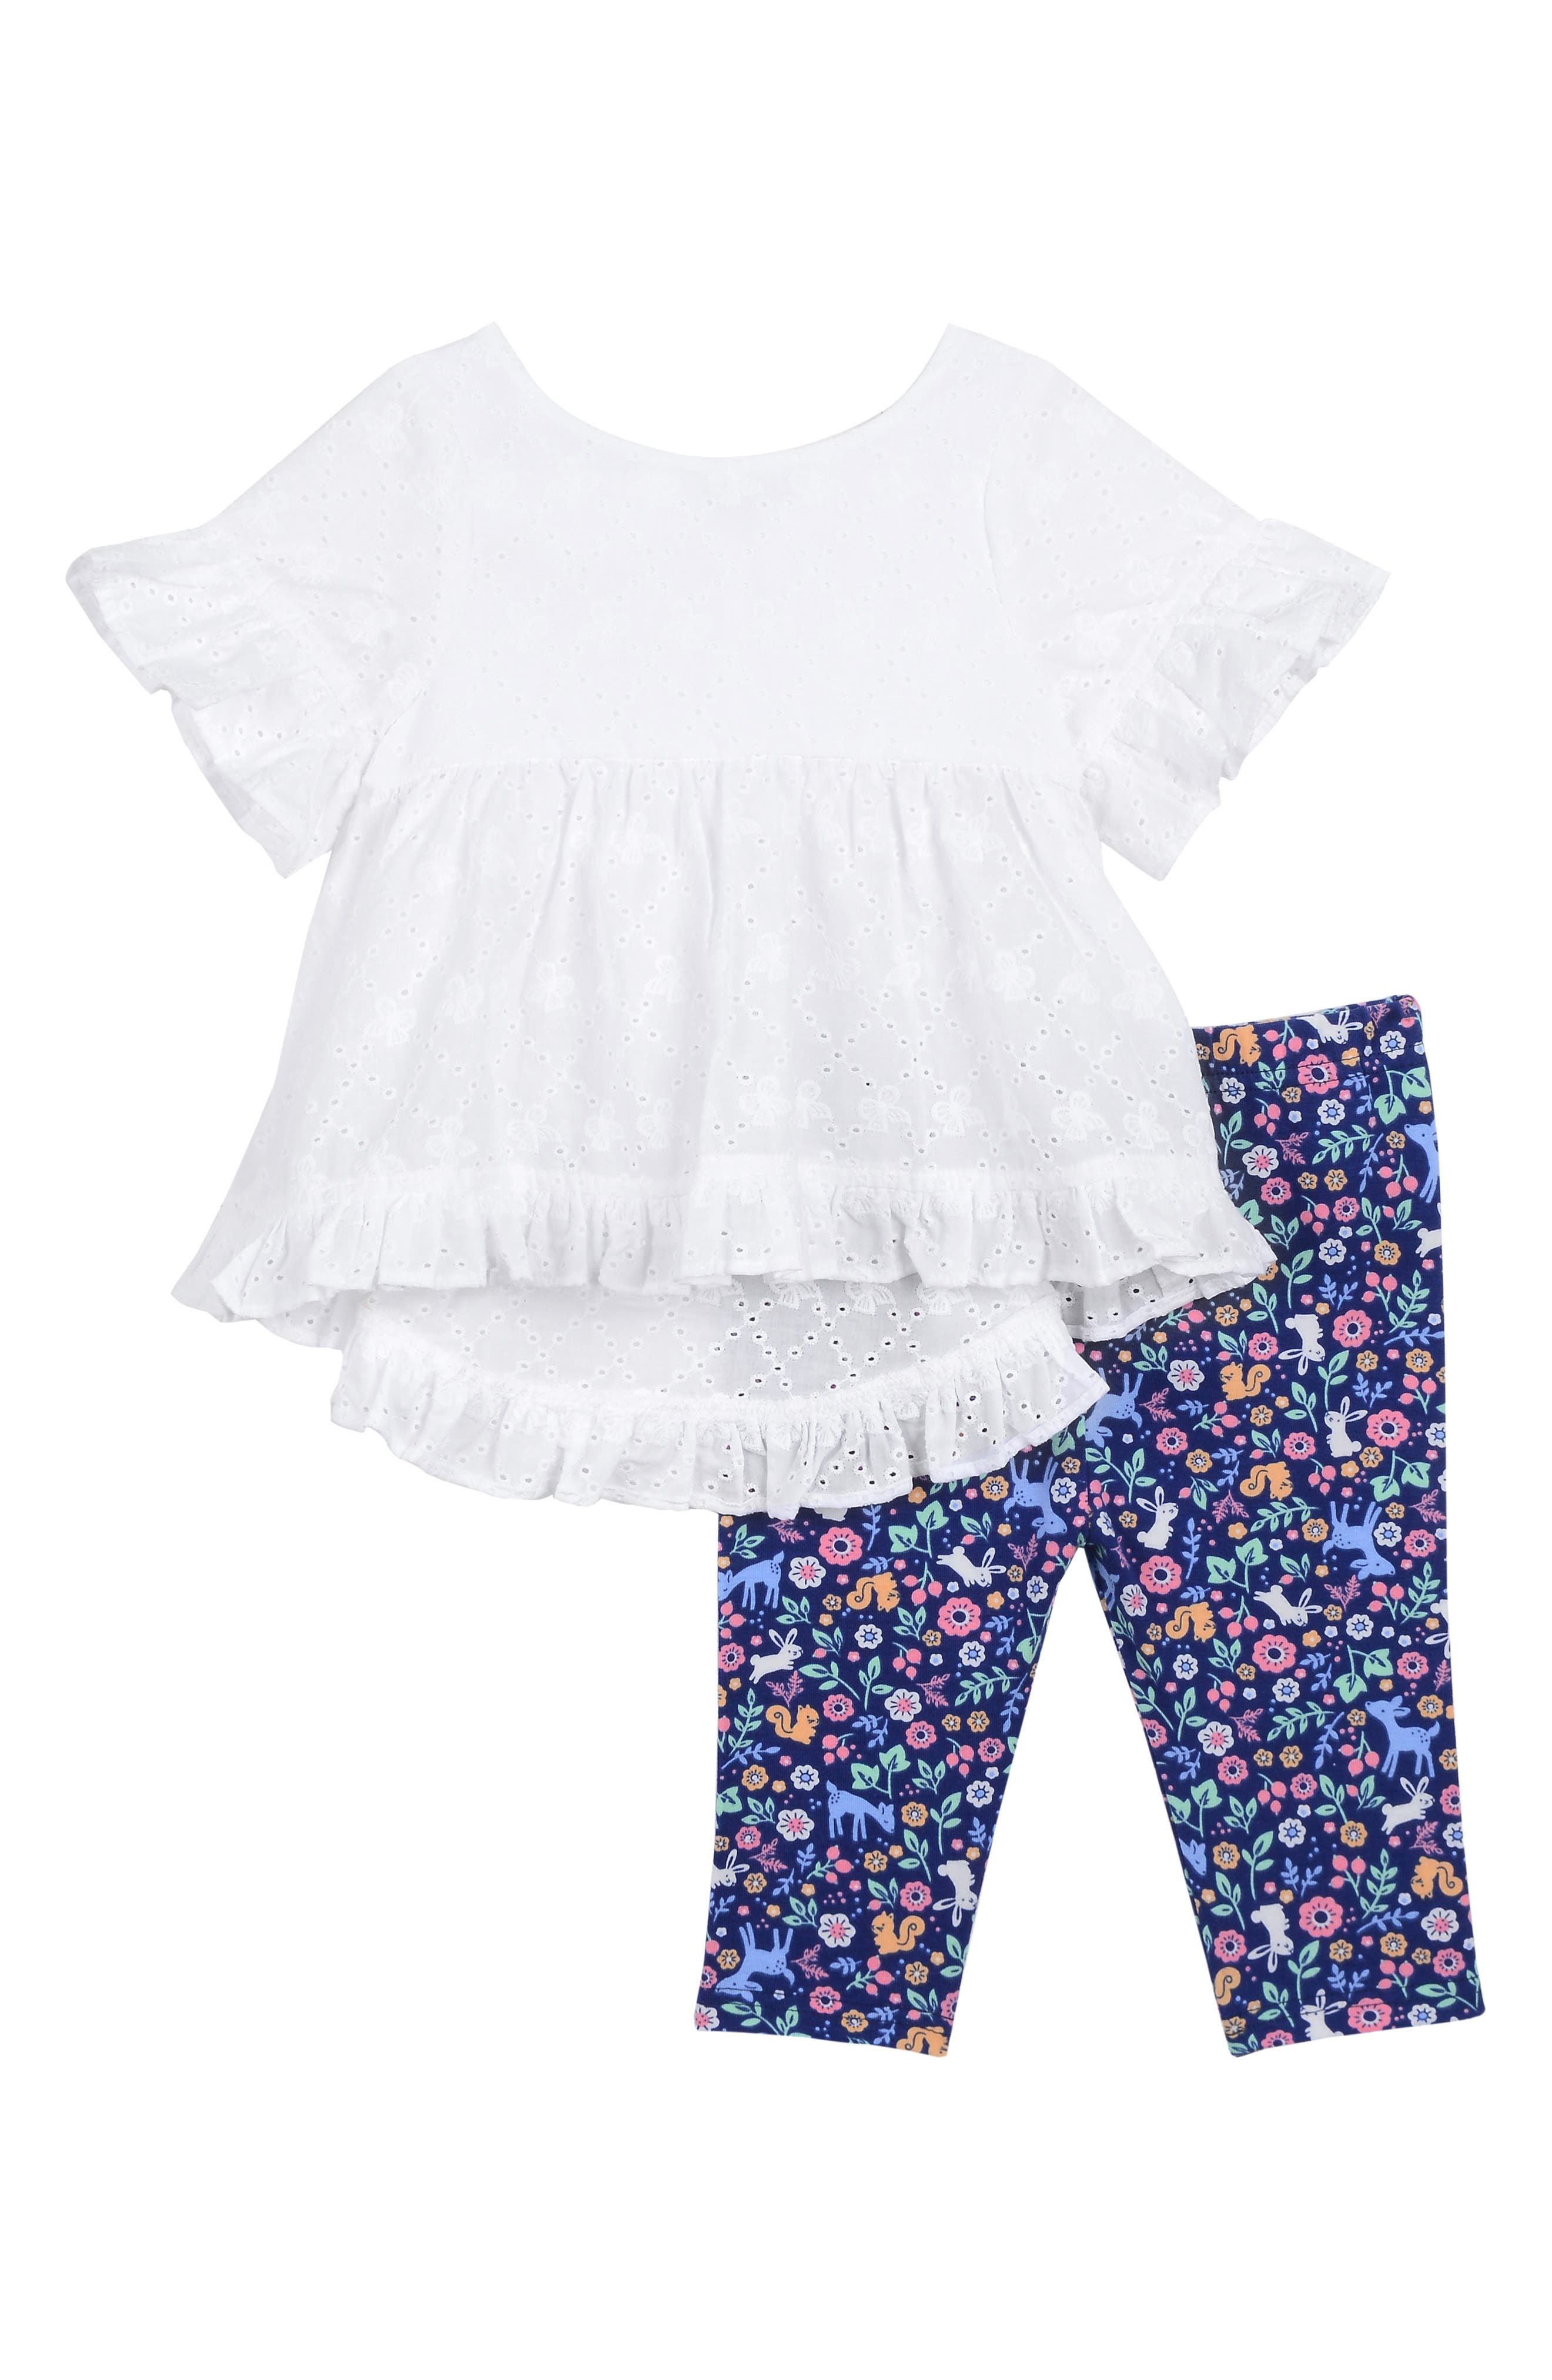 PASTOURELLE BY PIPPA & JULIE Eyelet Ruffle Top & Floral Leggings Set, Main, color, WHITE